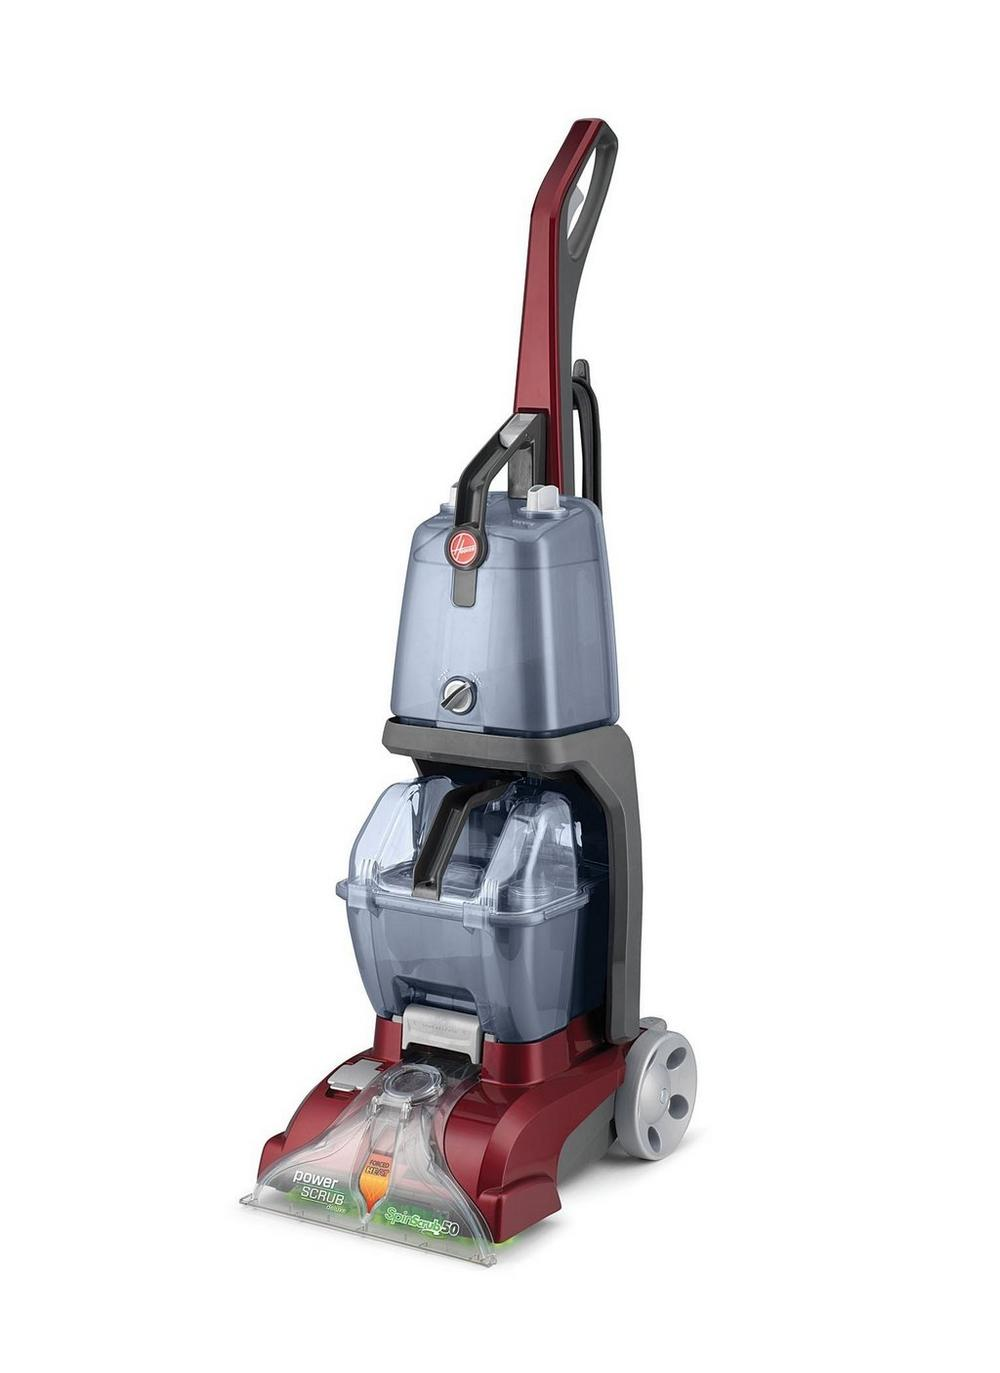 Power Scrub Deluxe Multifloor Carpet Cleaner2